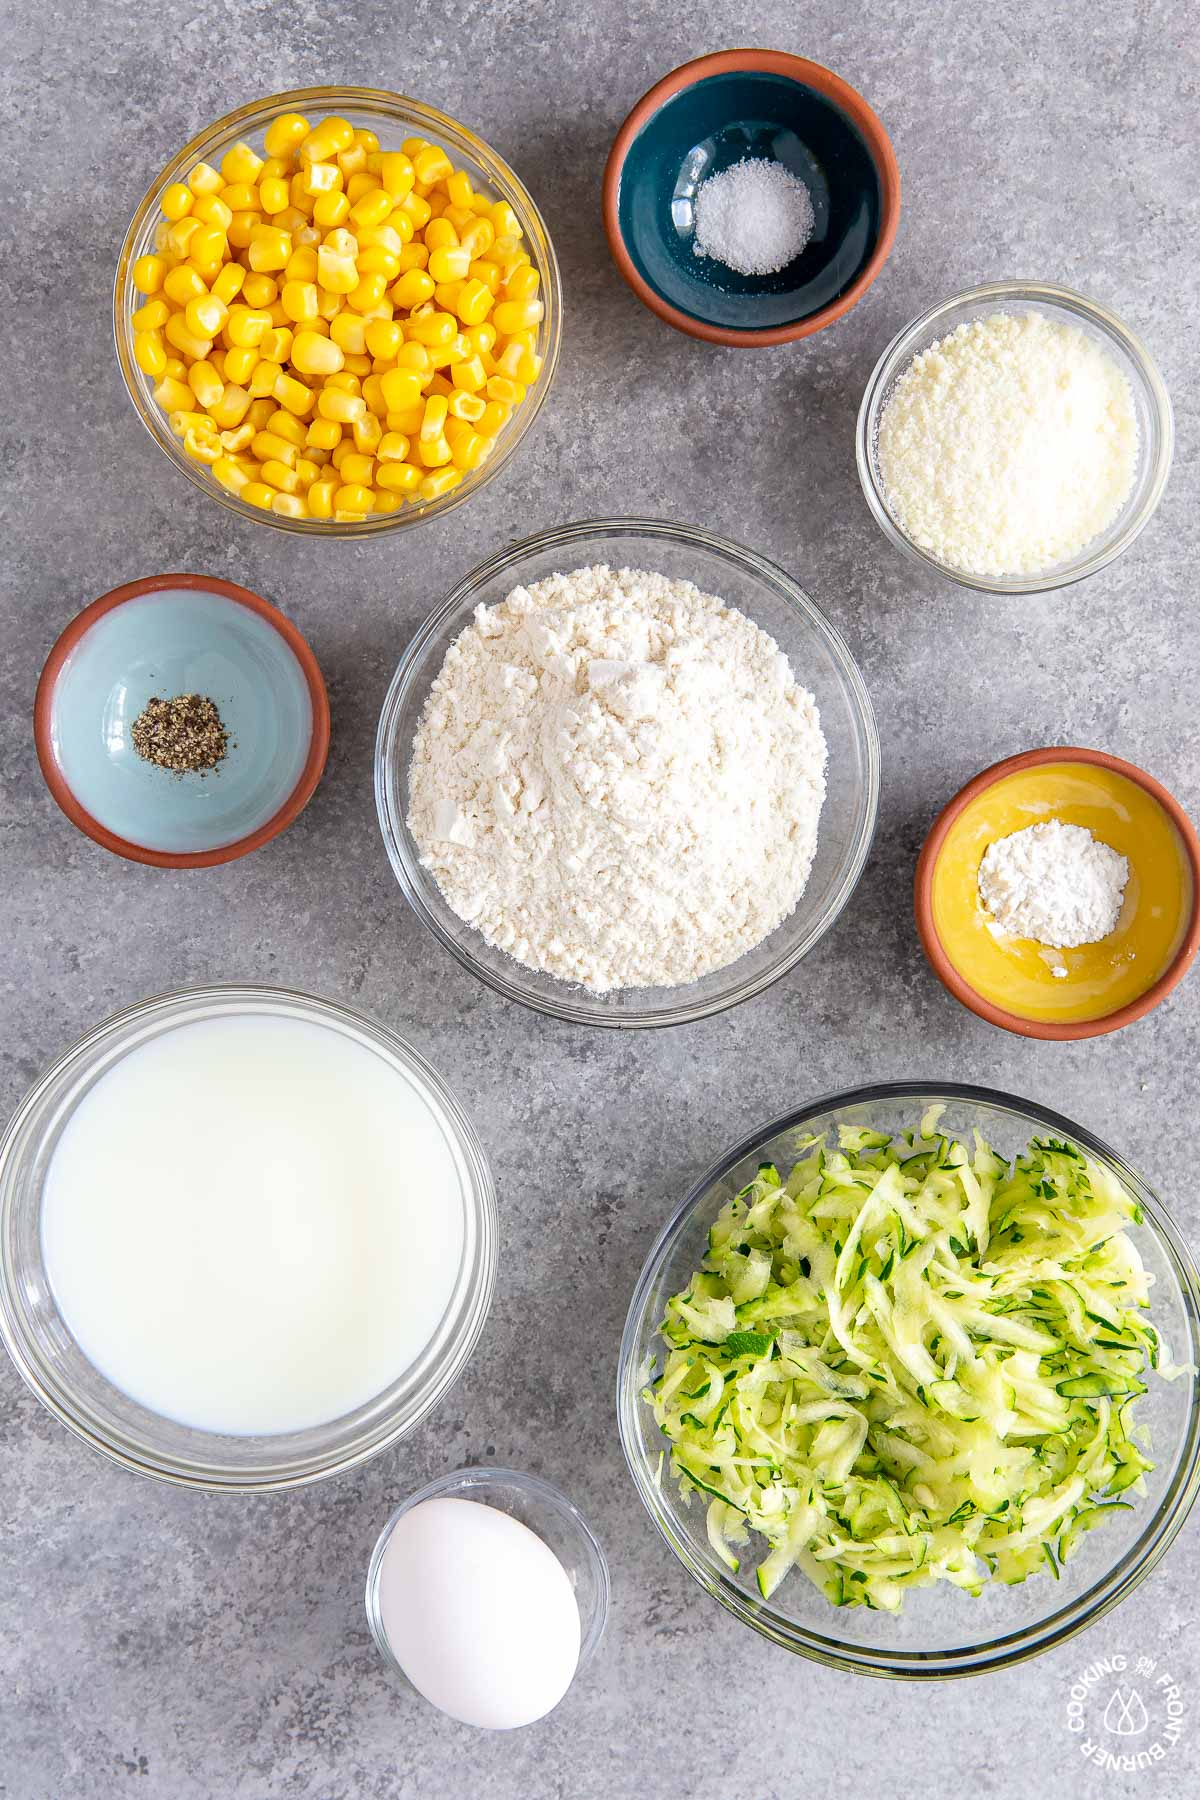 in bowls-corn, grated zucchini, cheese, salt, pepper, milk, flour, baking powder